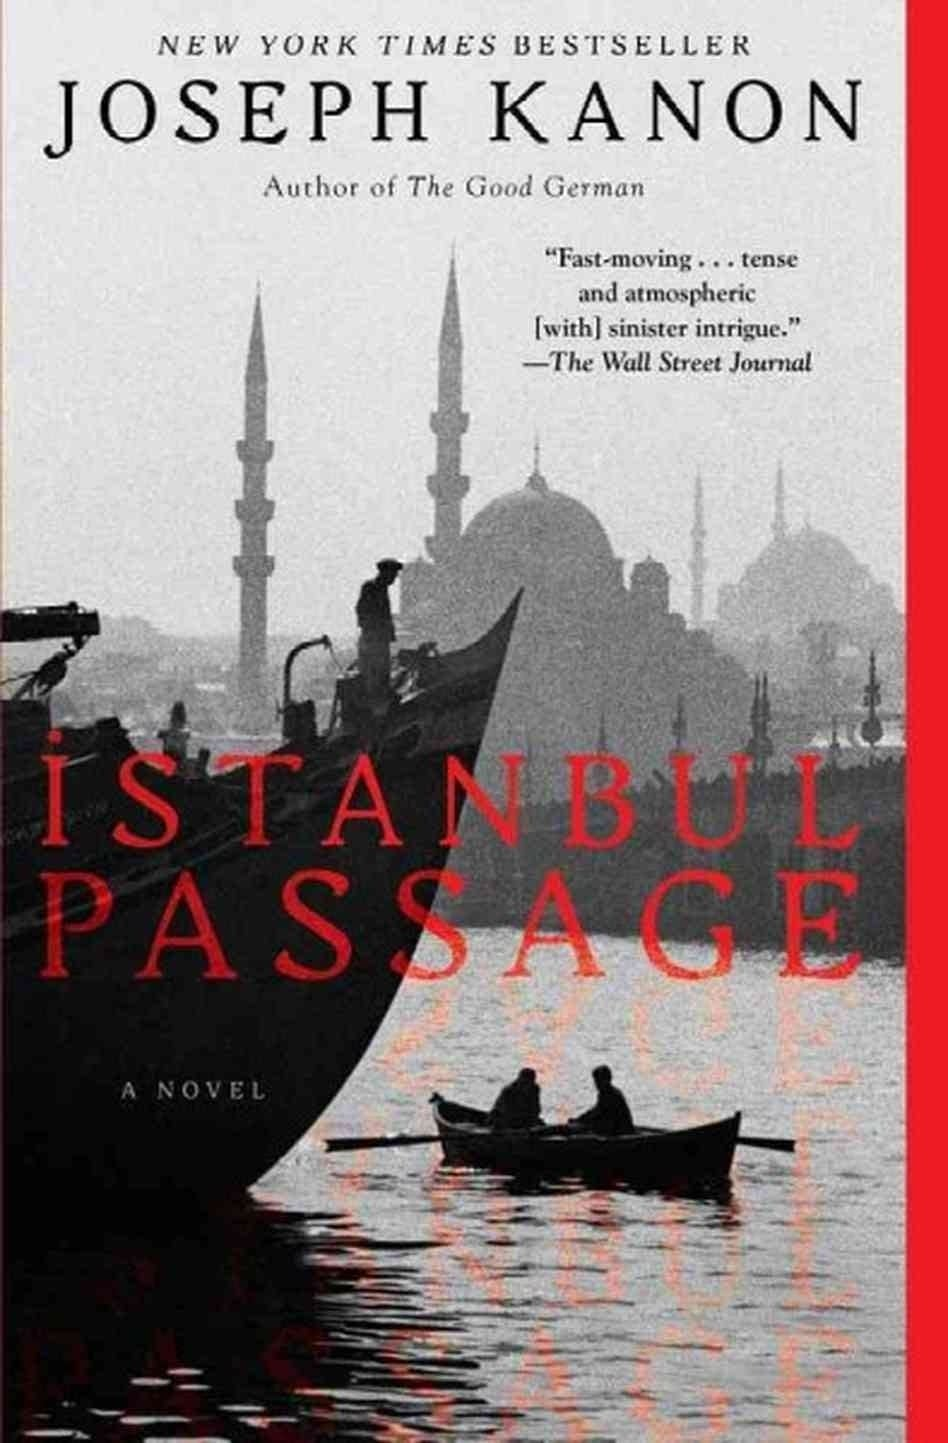 'Istanbul Passage' by Joseph Kanon